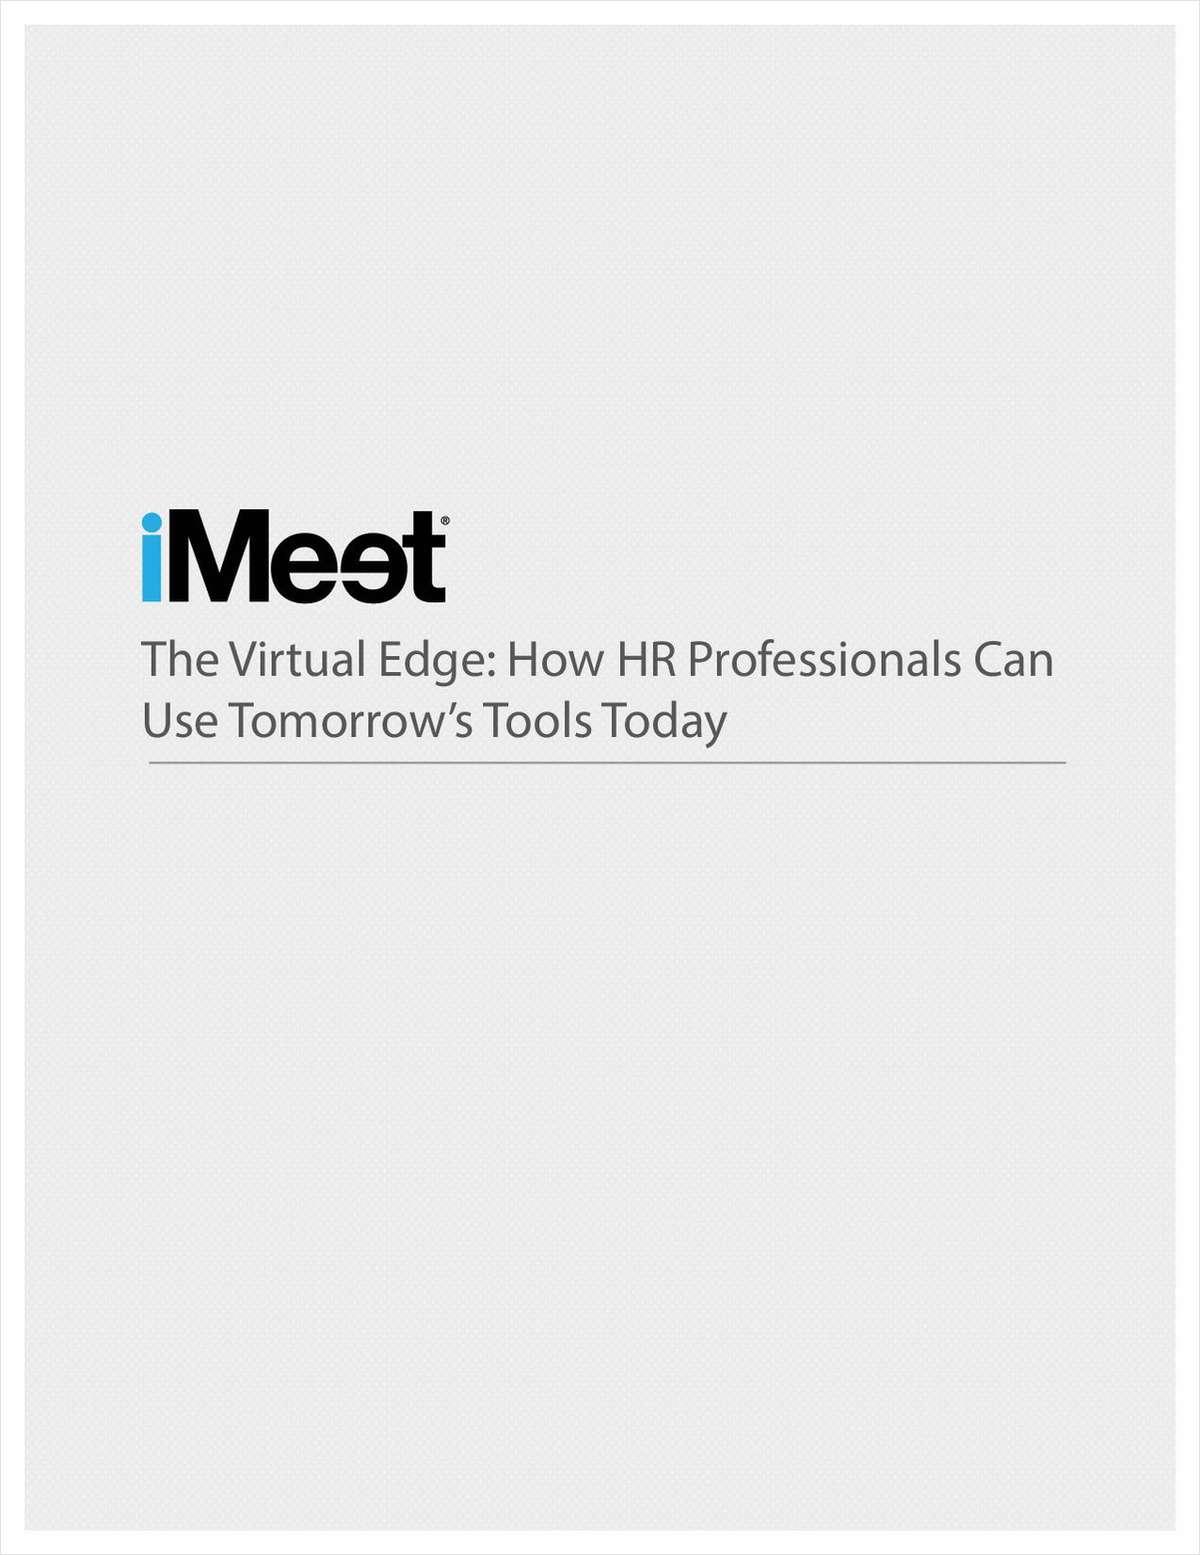 How HR Professionals Can Gain the Virtual Edge